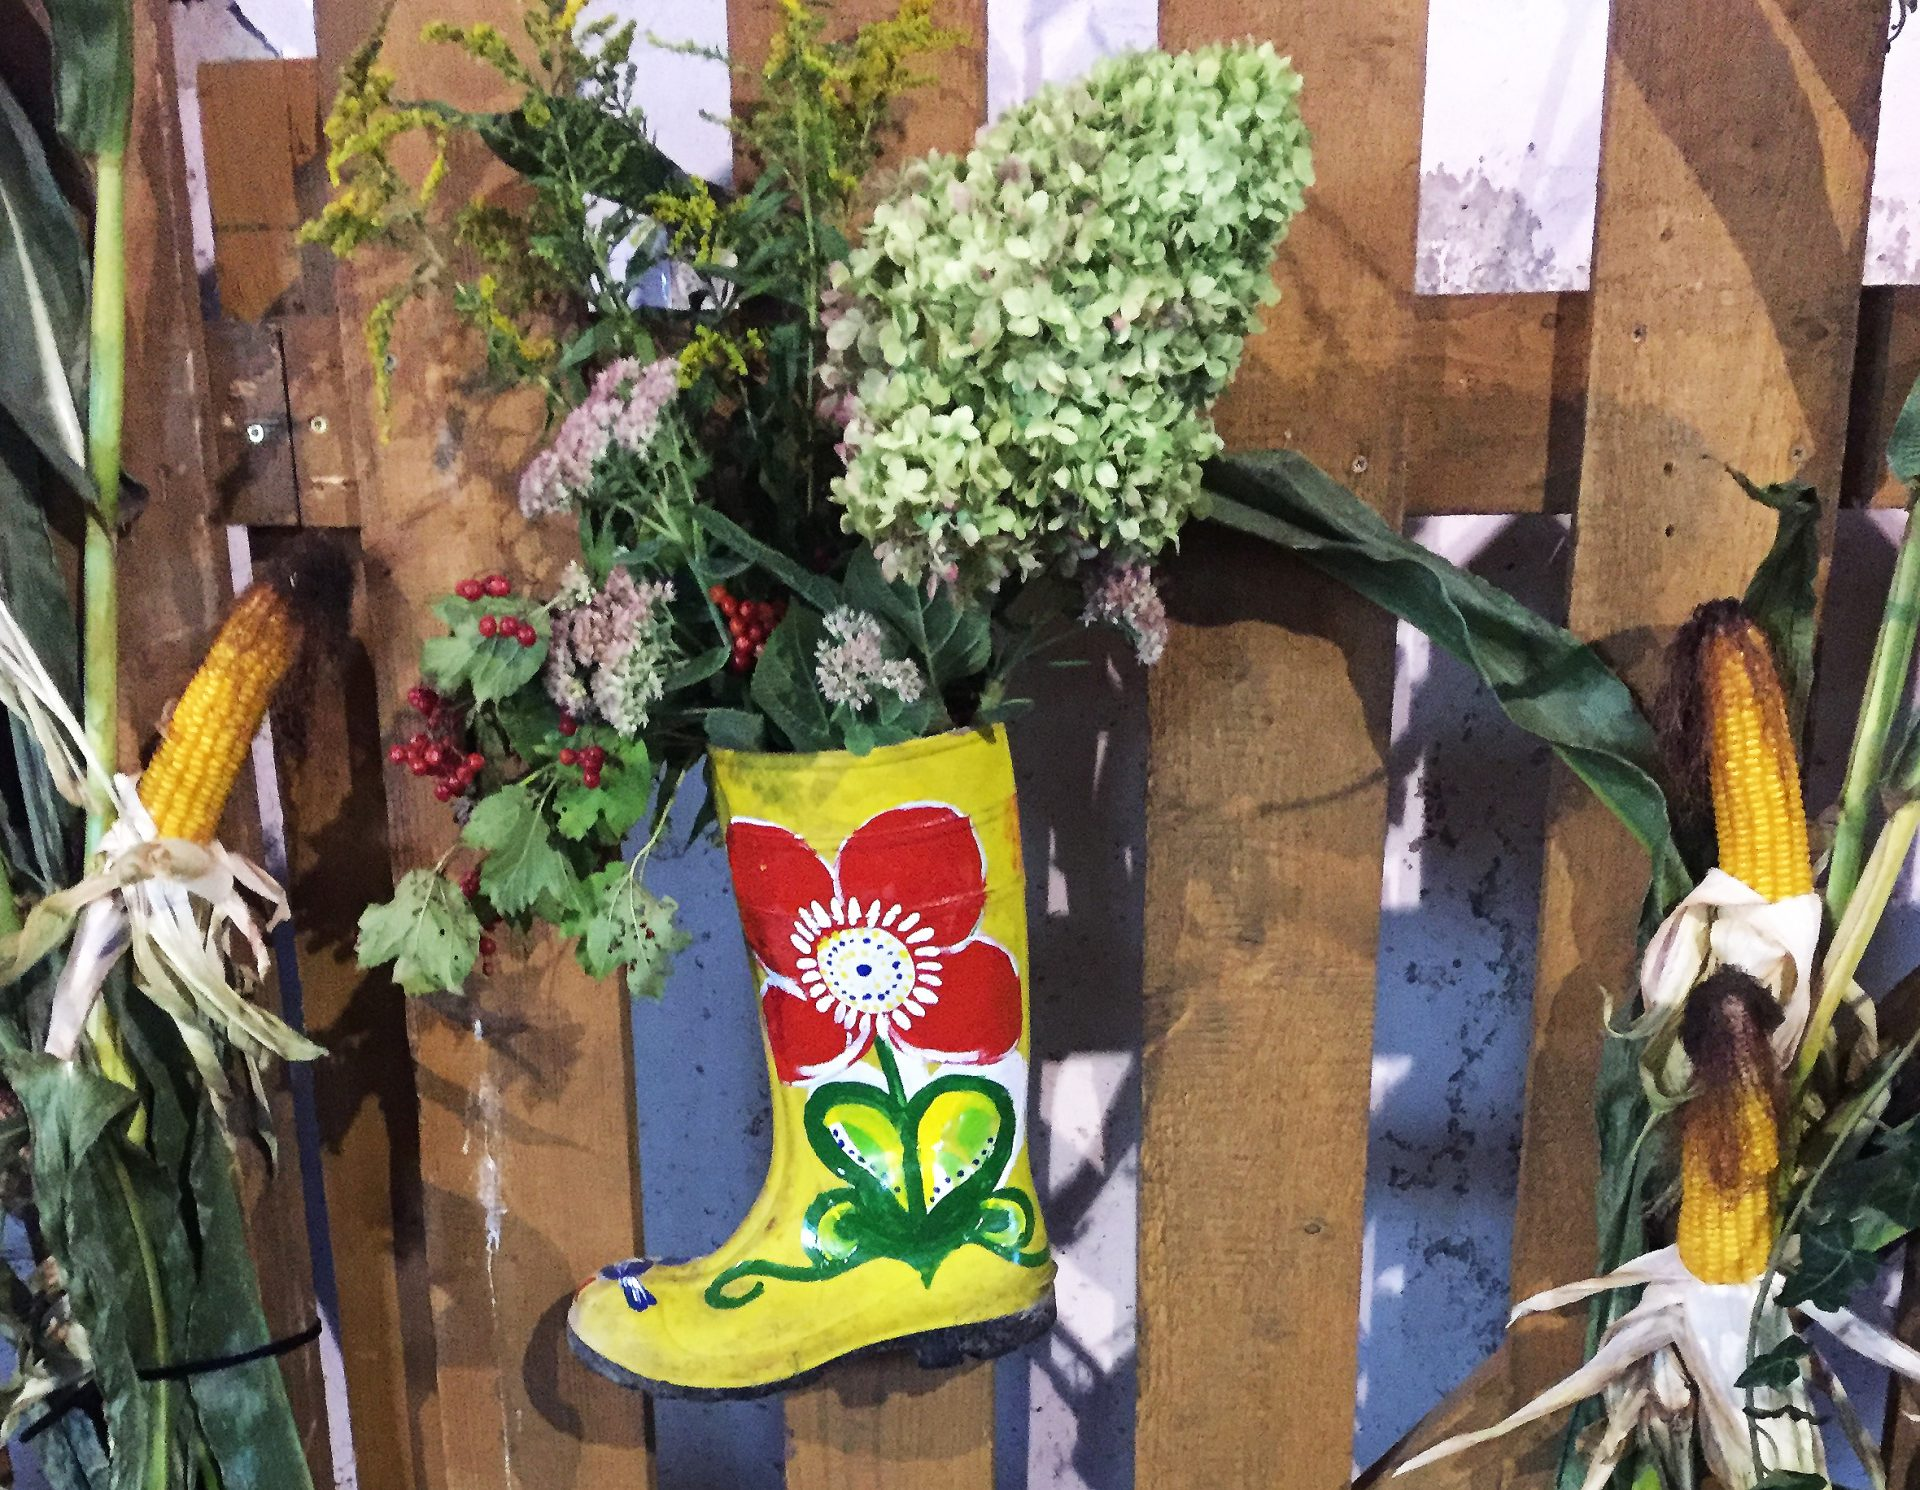 bemalter Gummistiefel hängt am Gartentor